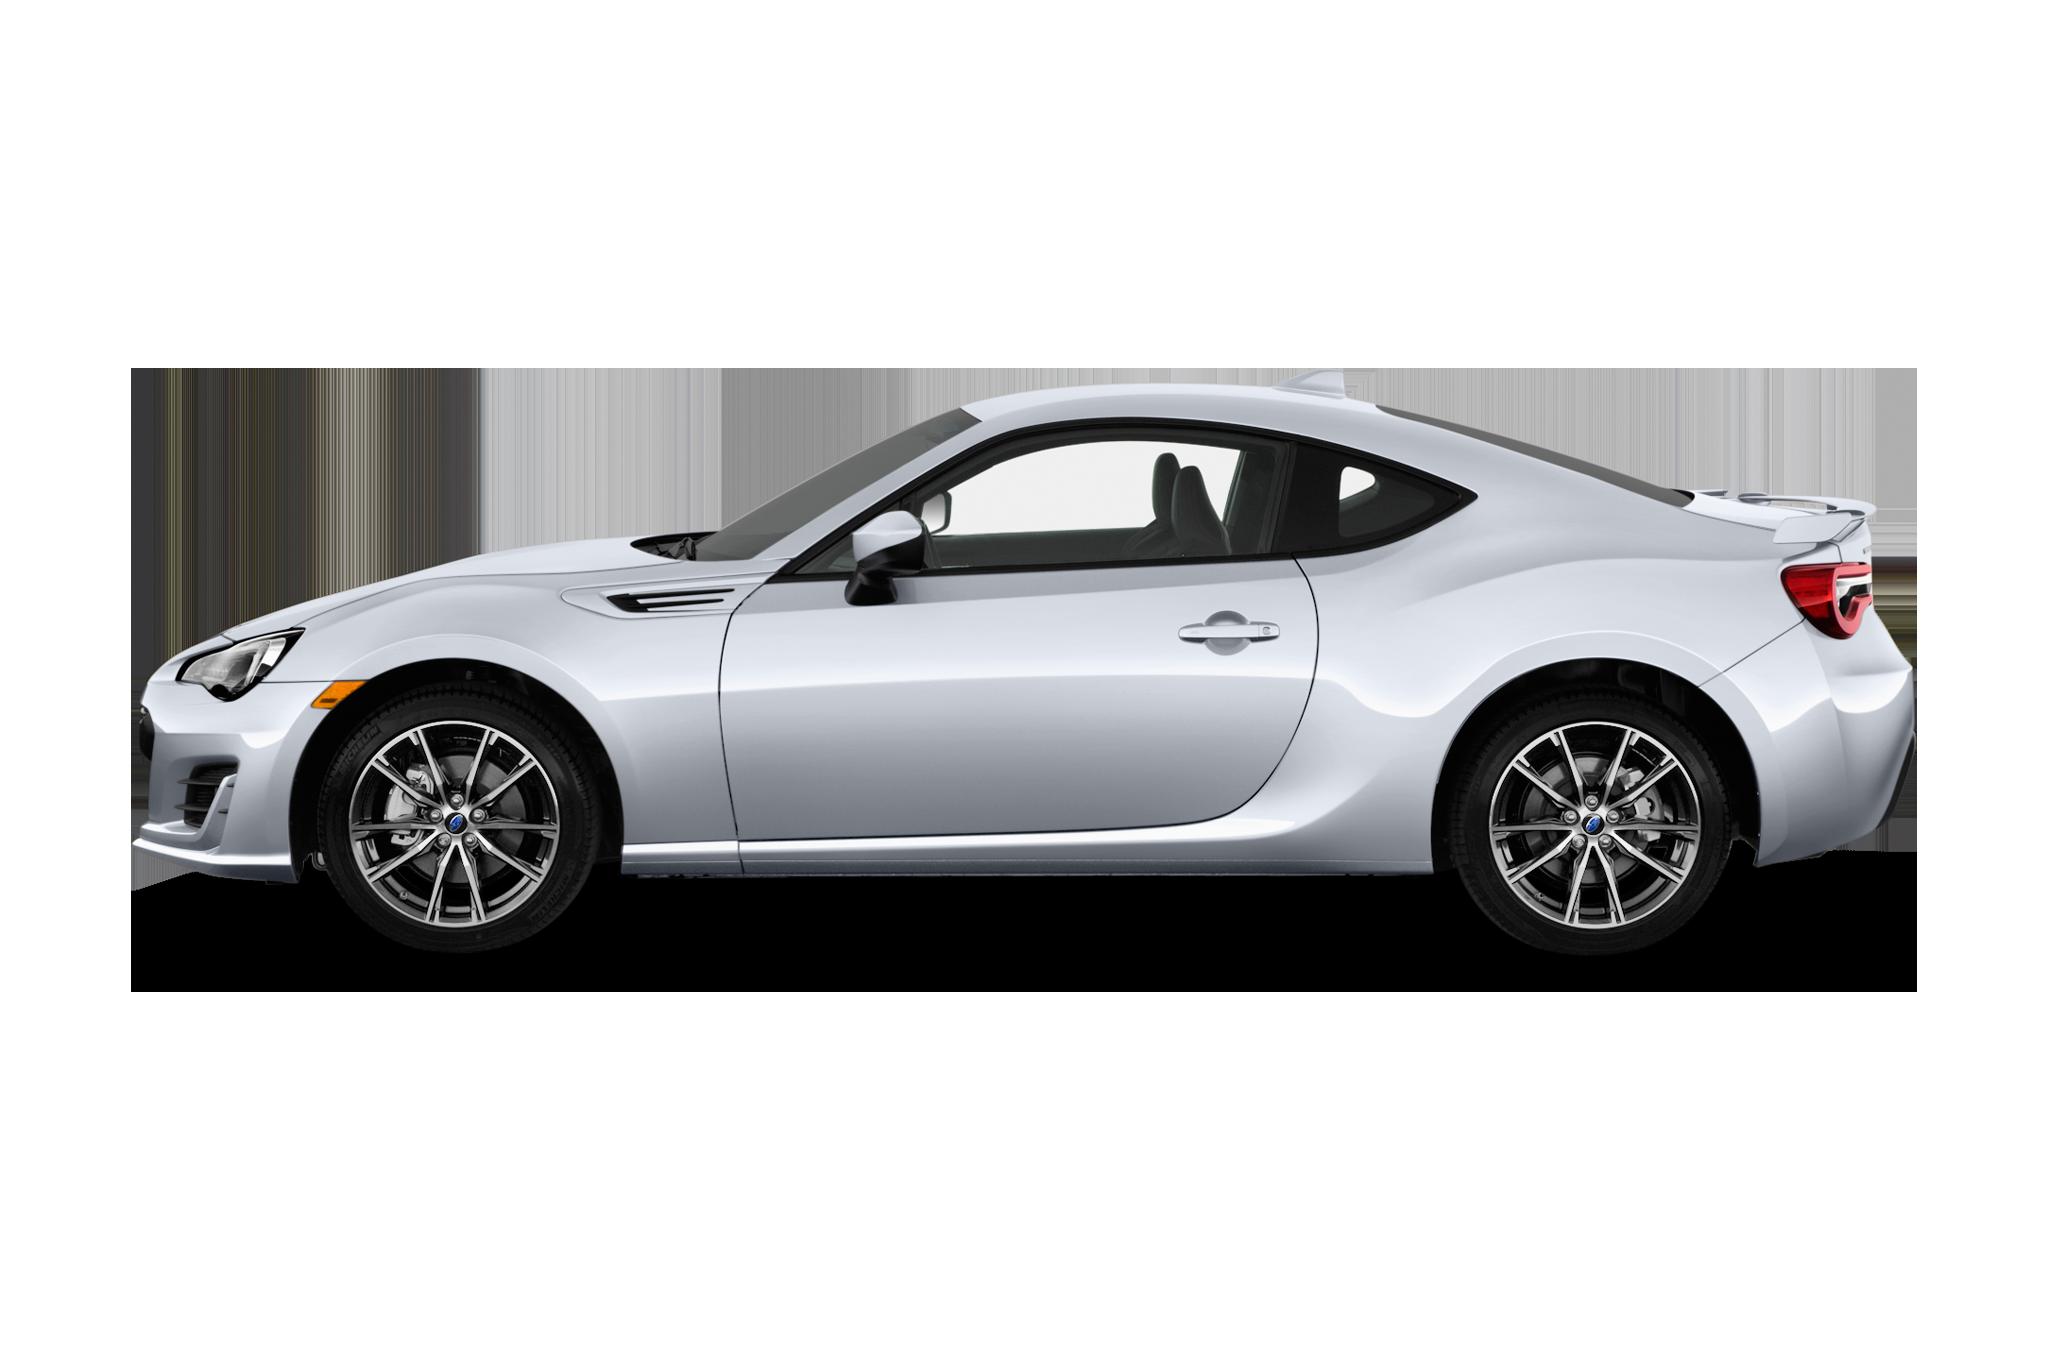 Brz Sti Specs >> Subaru Ups Performance Envelope With 2018 WRX STI Type RA ...